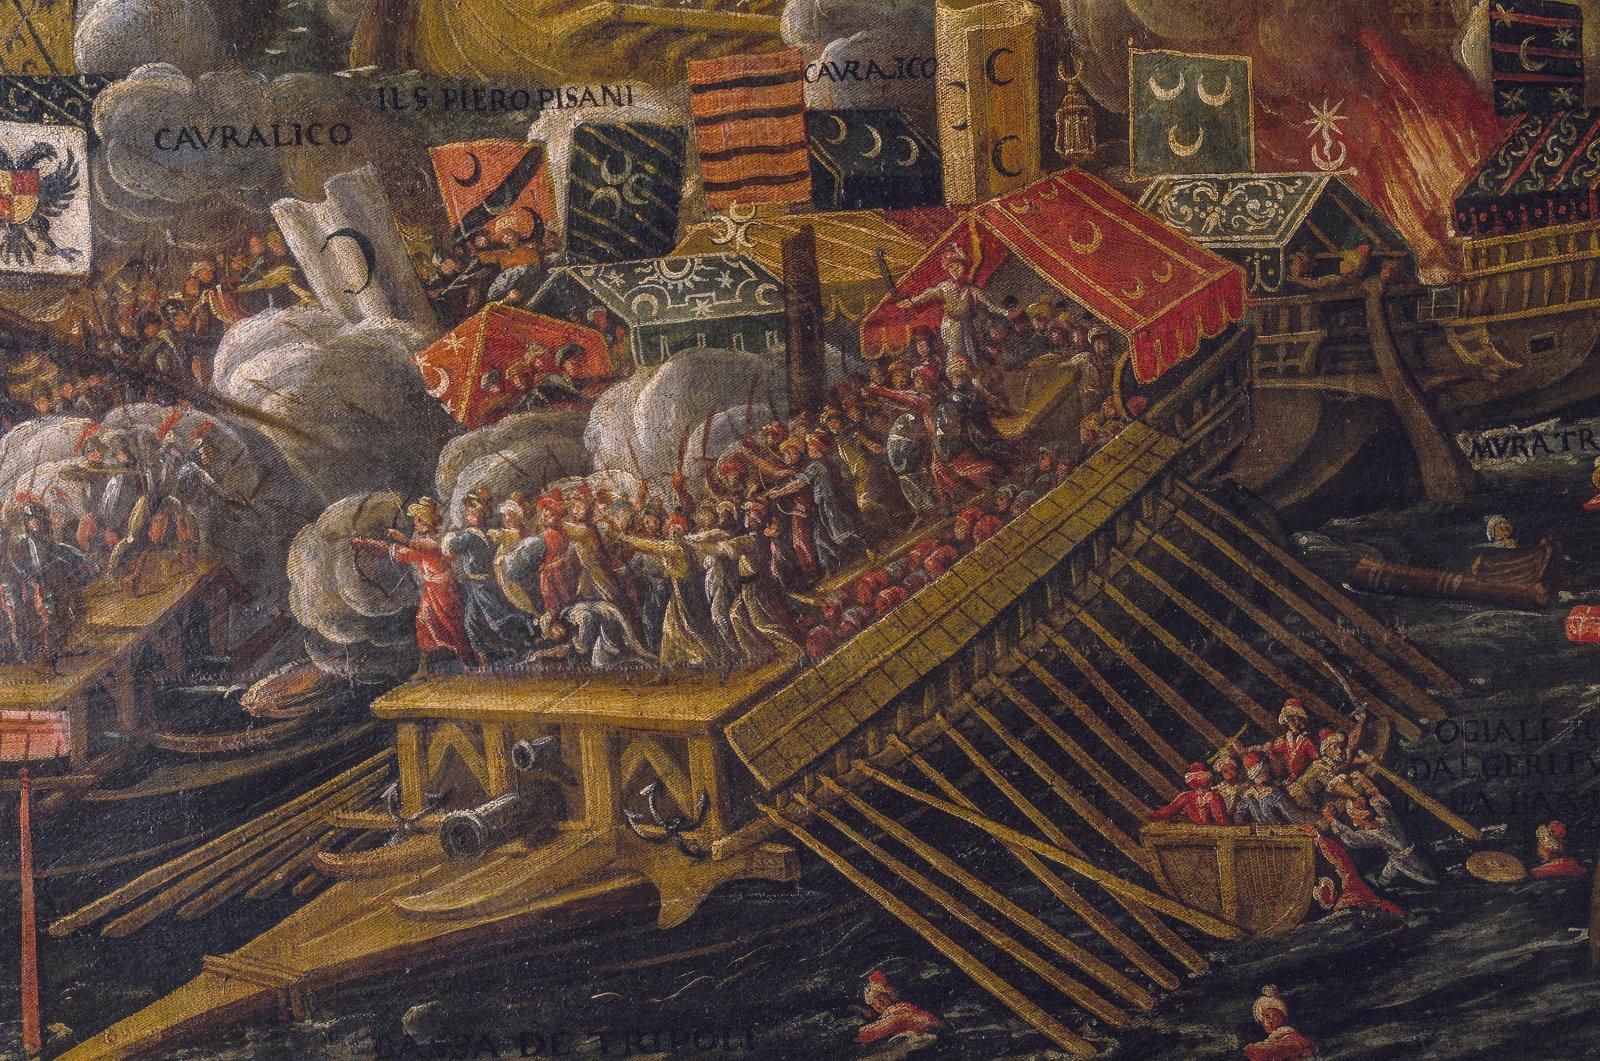 Battle of Lepanto: Indecisive maritime defeat of Ottoman Empire